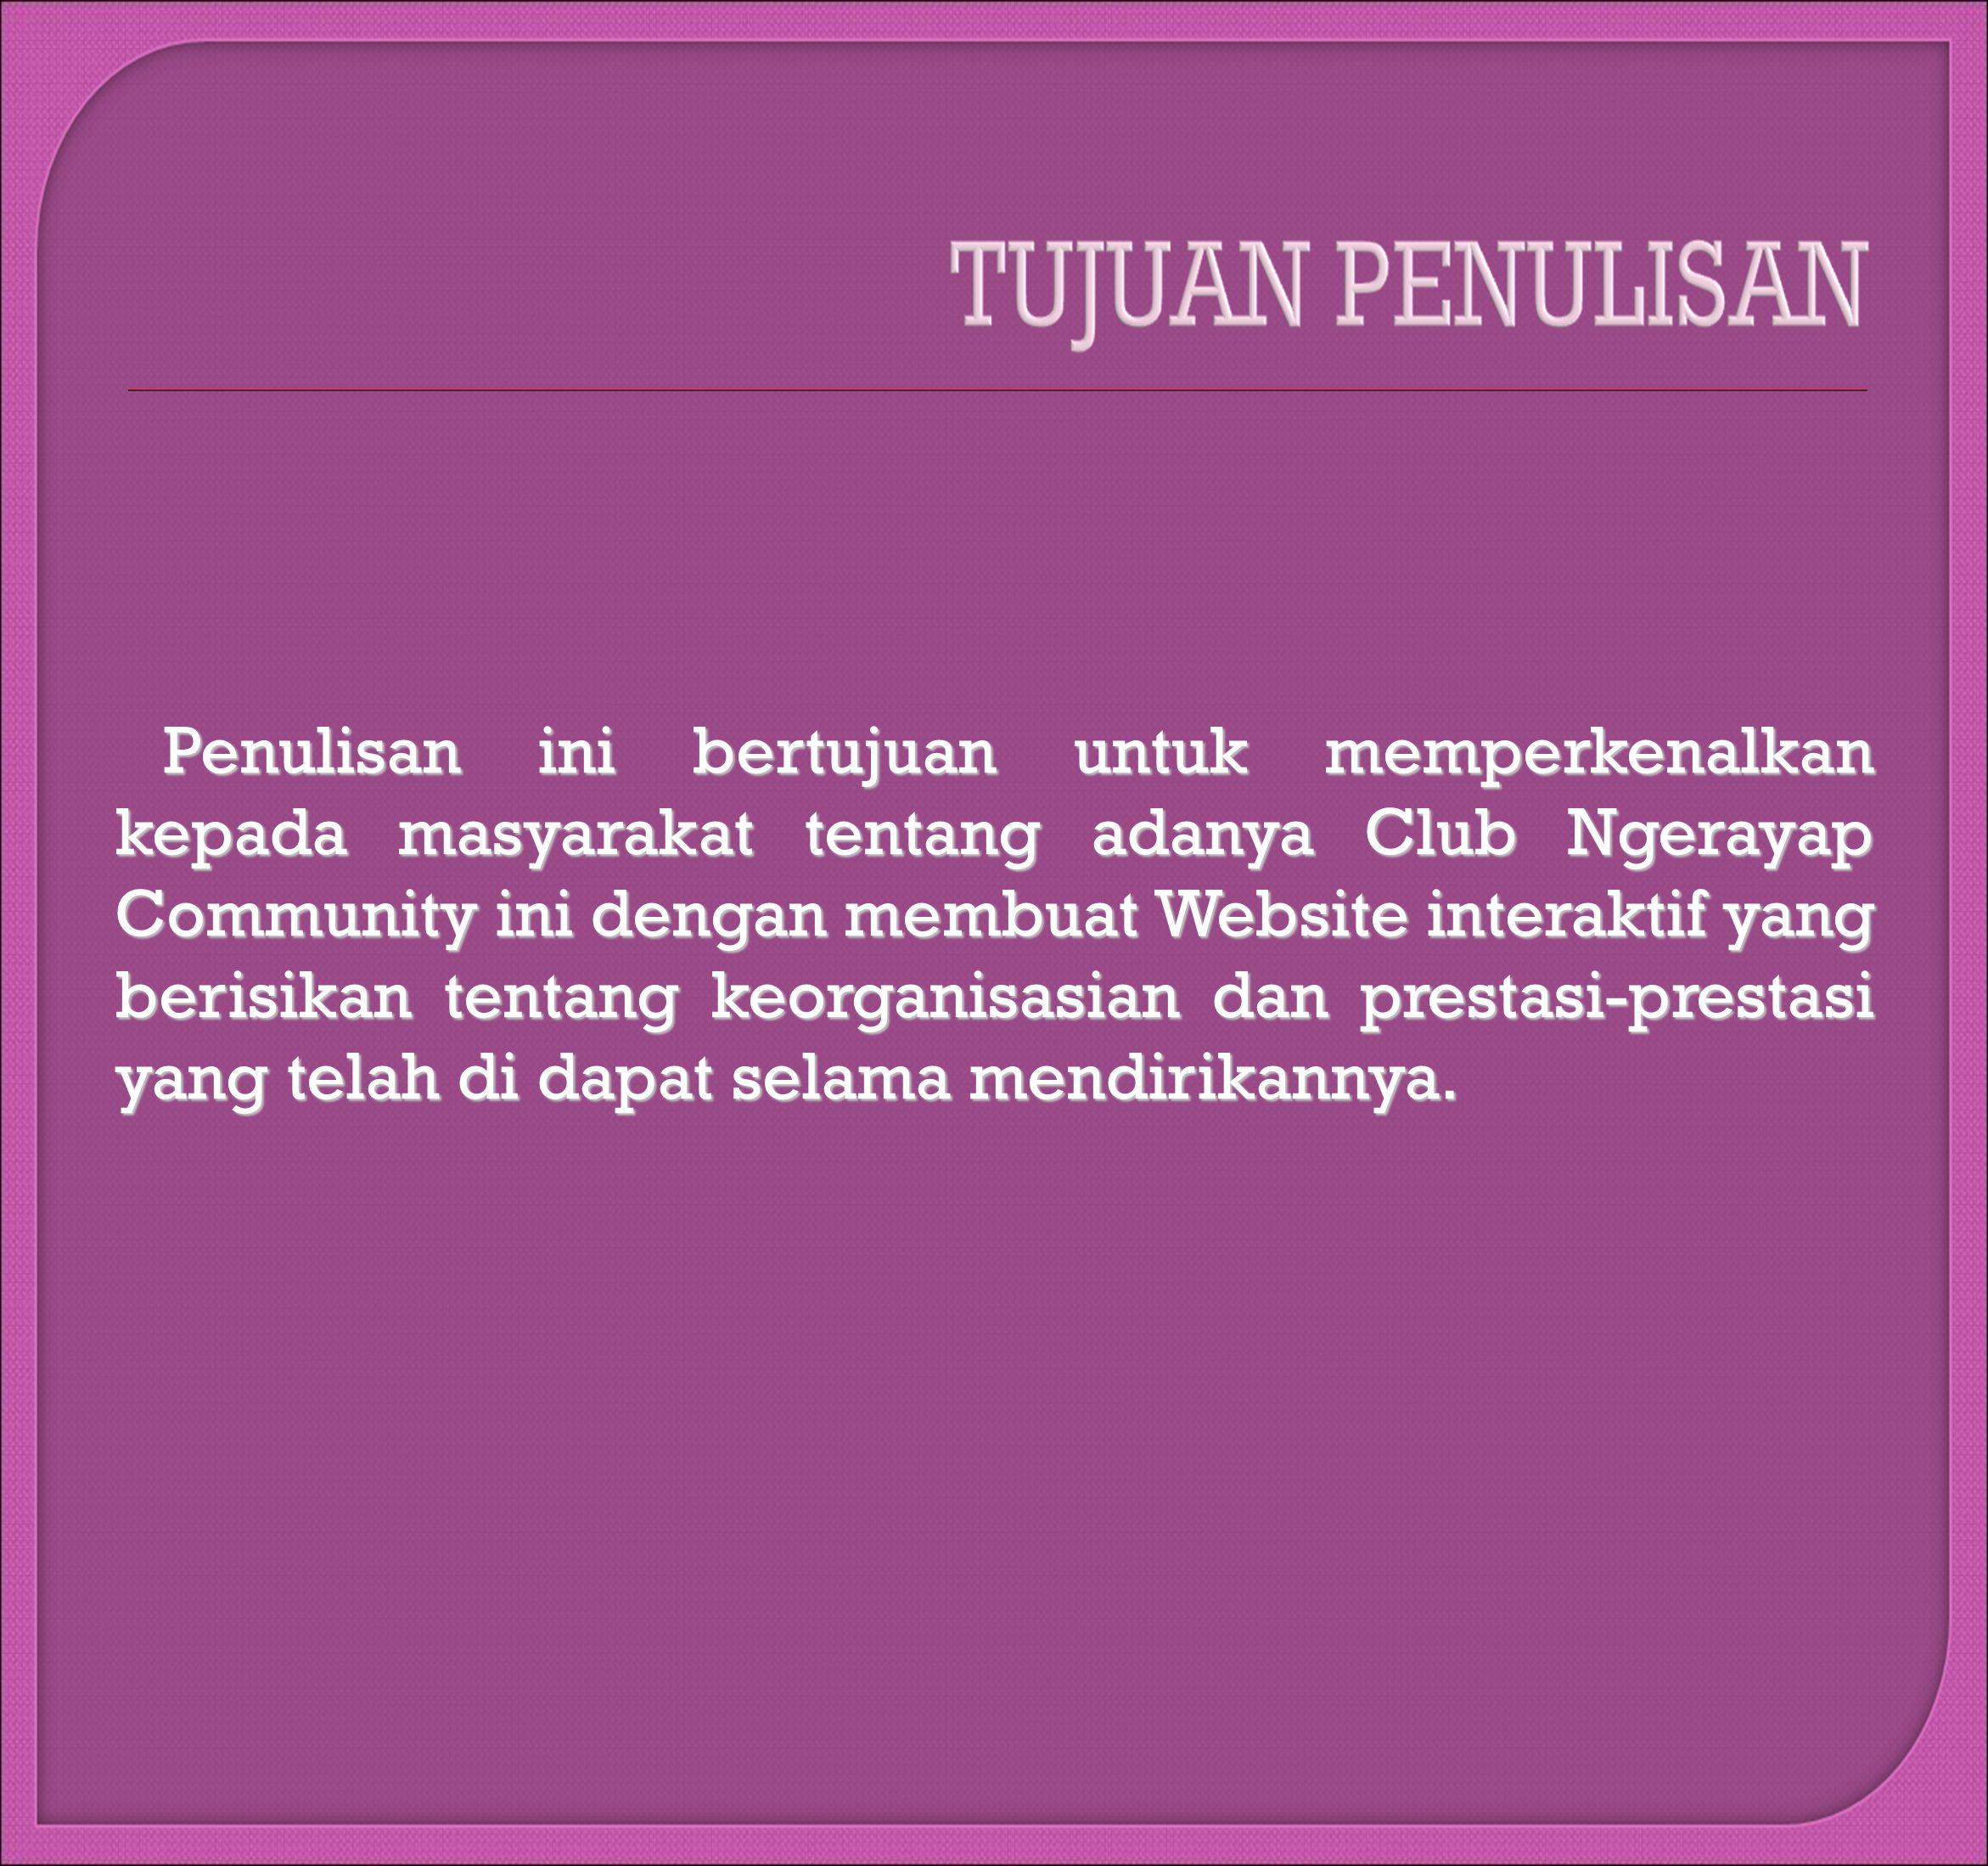 Penulisan ini bertujuan untuk memperkenalkan kepada masyarakat tentang adanya Club Ngerayap Community ini dengan membuat Website interaktif yang berisikan tentang keorganisasian dan prestasi-prestasi yang telah di dapat selama mendirikannya.